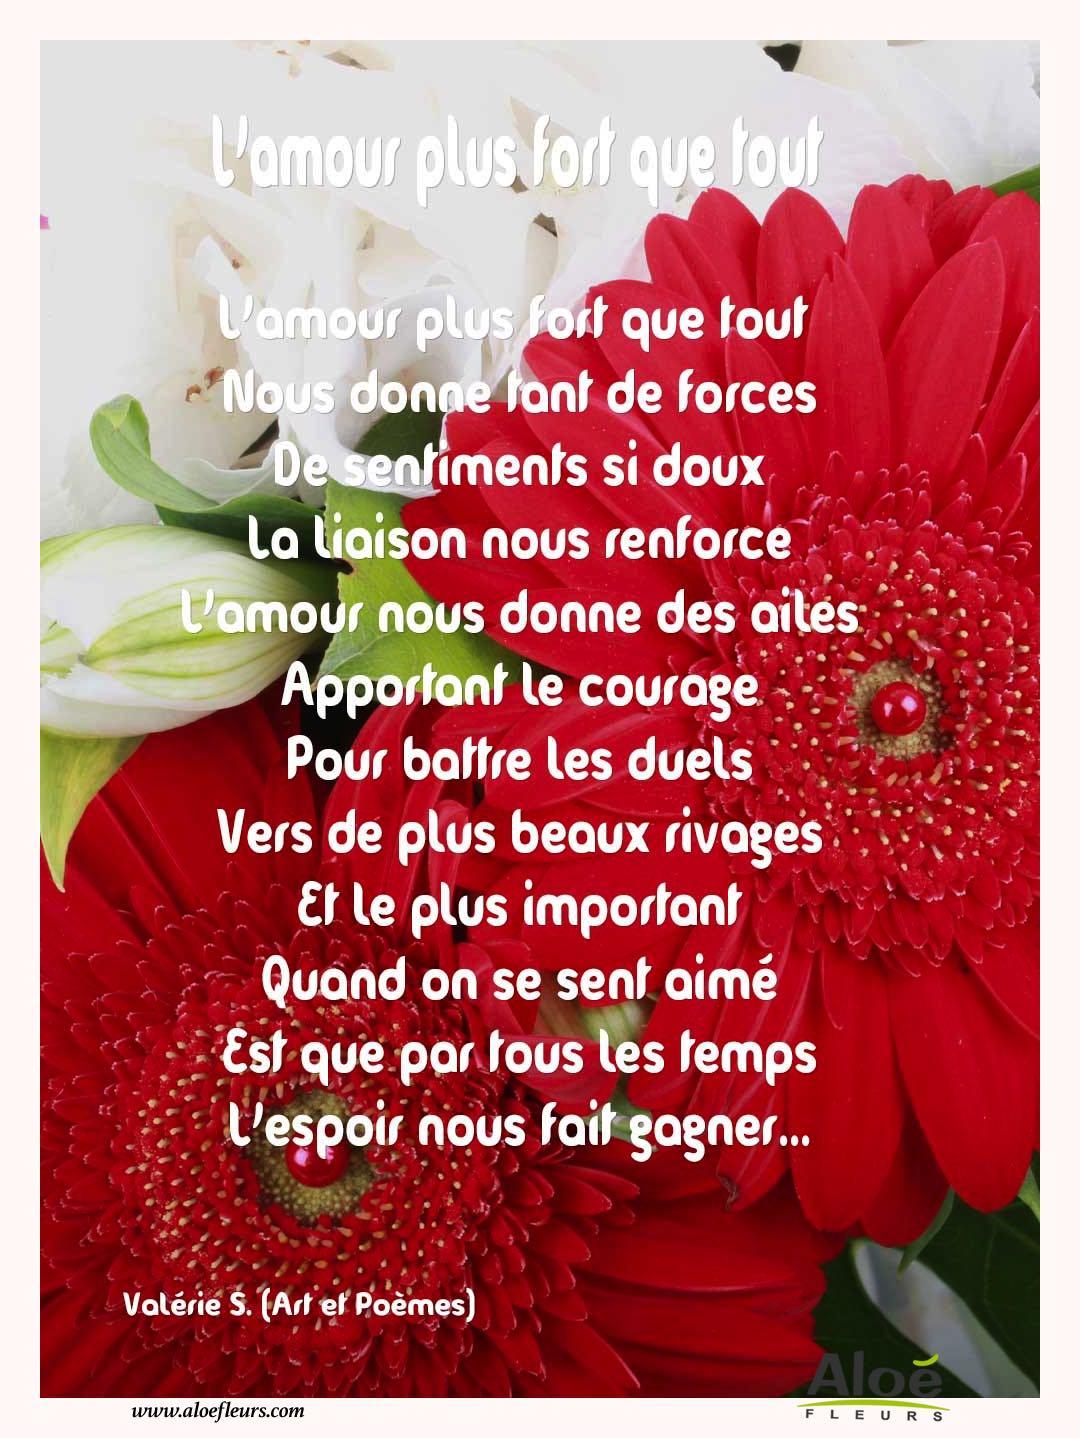 Poeme belle rencontre